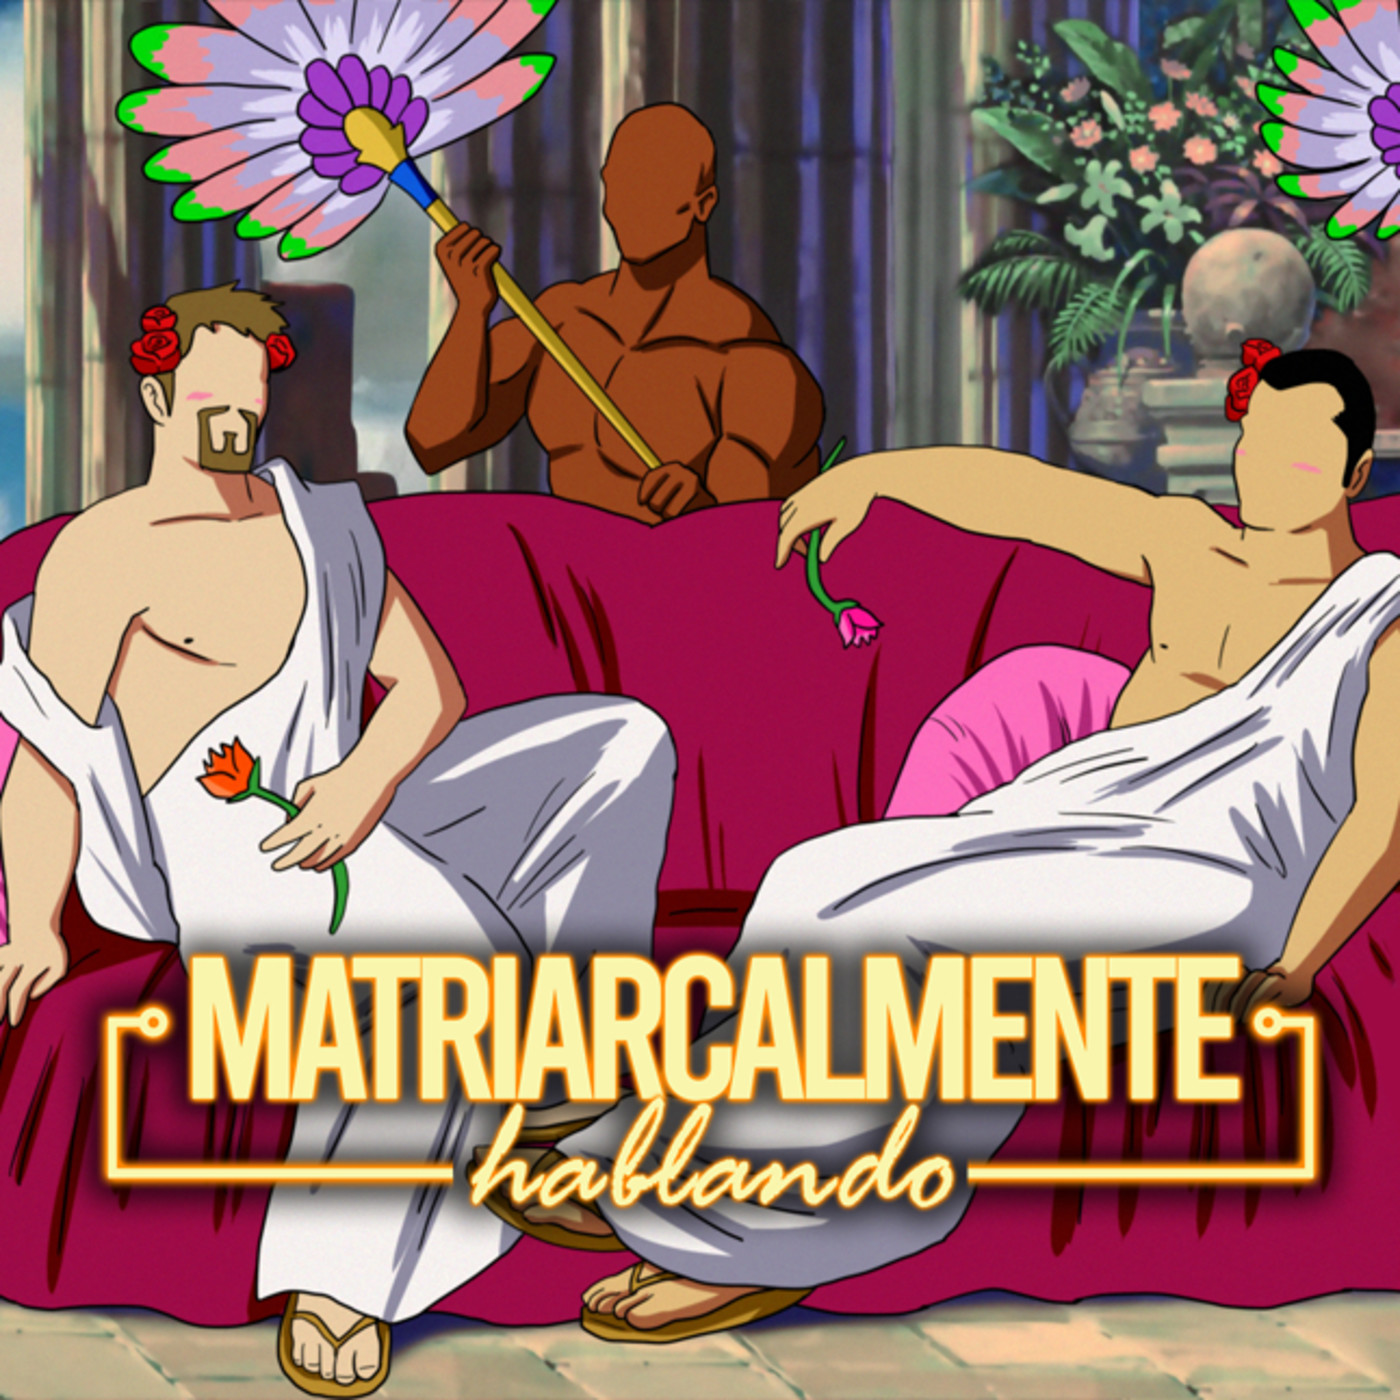 Retrasos Apruebonados (feat. Ivanba)